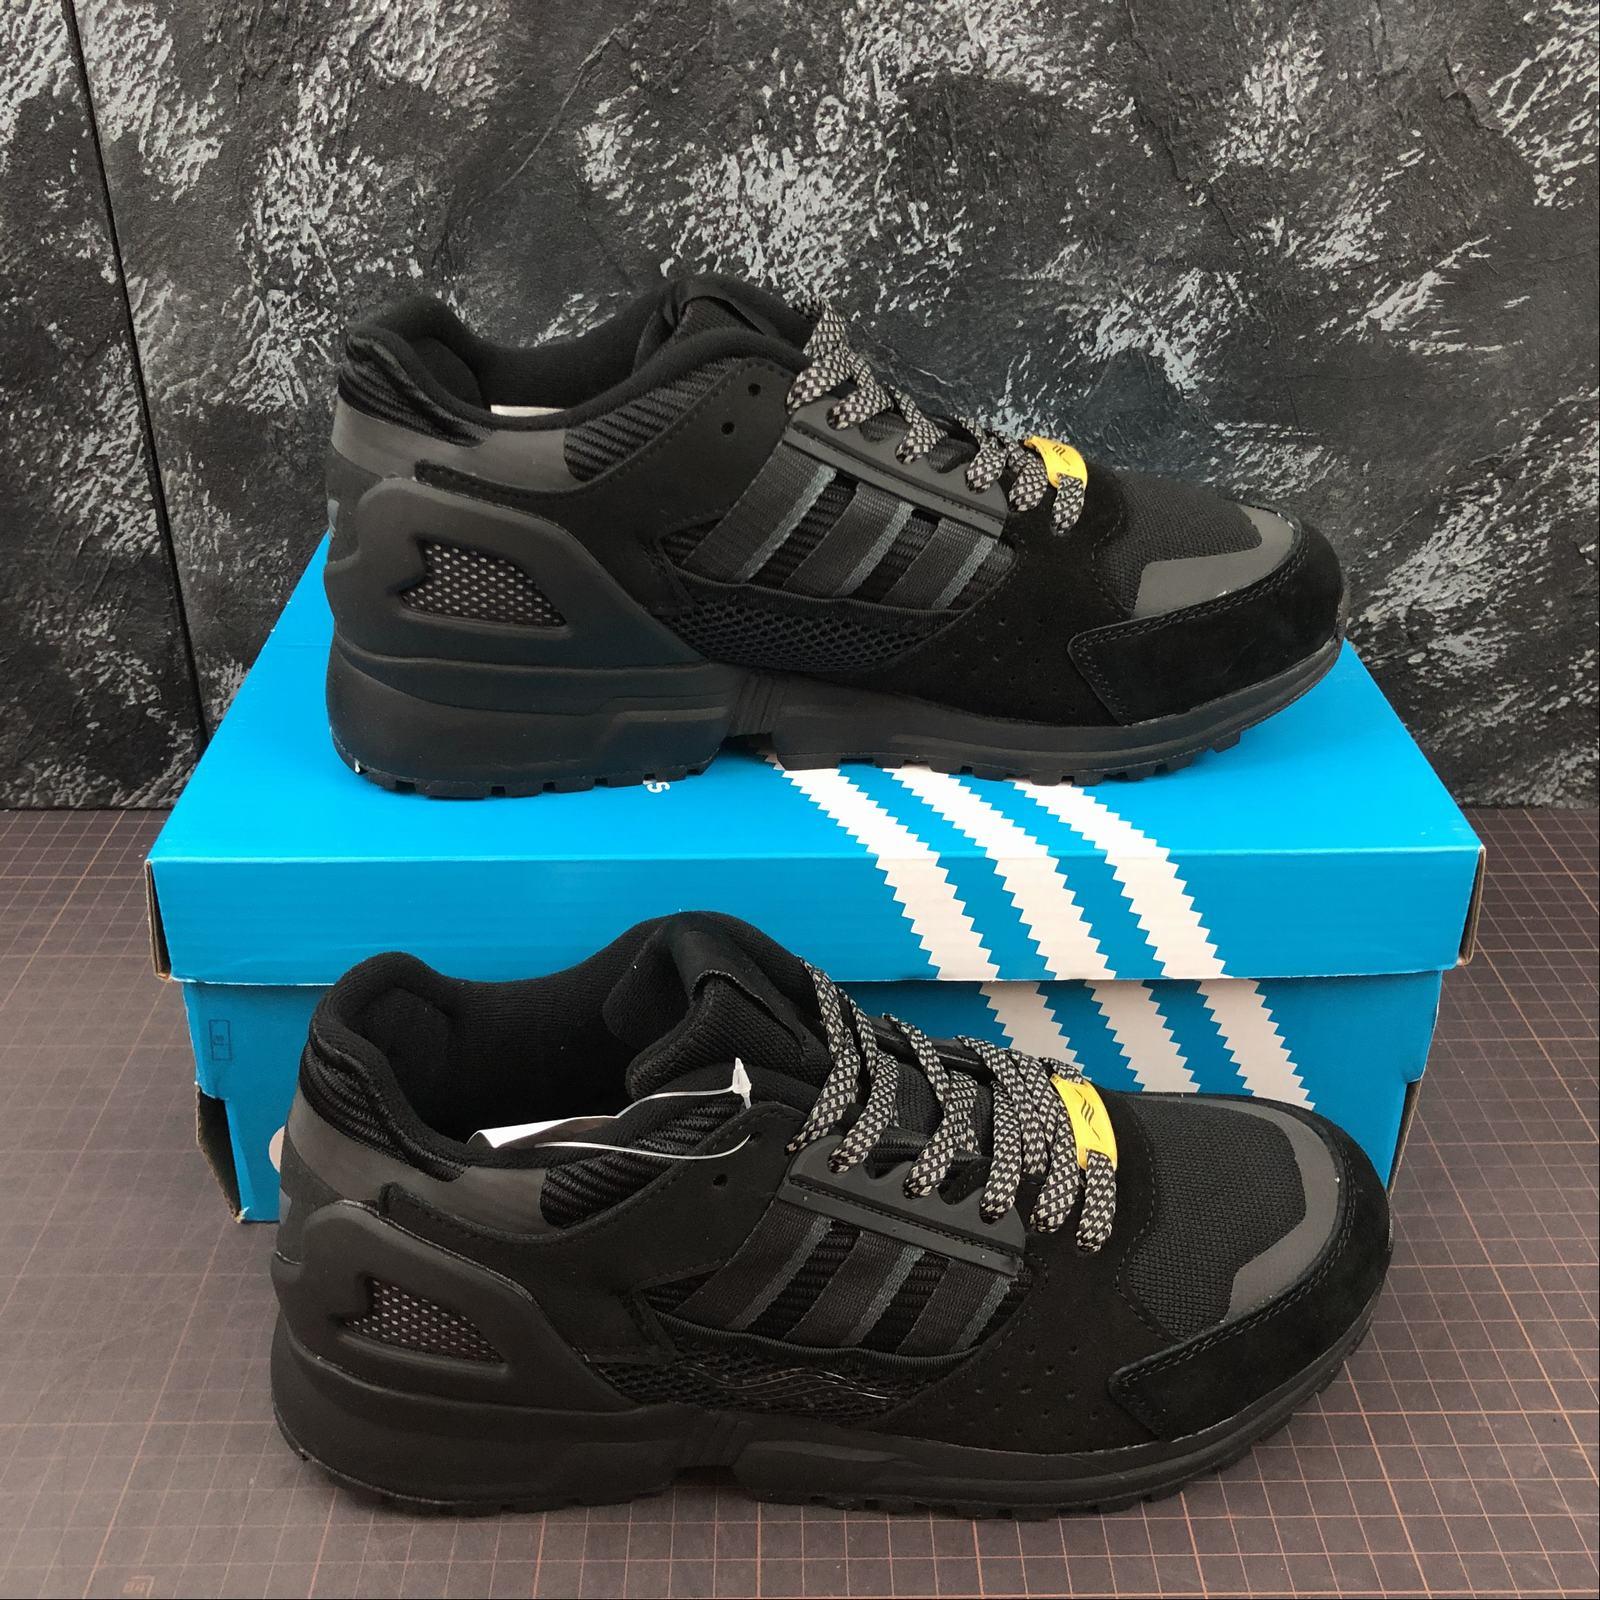 giay-sneaker-adidas-zx10000-c-ee9487